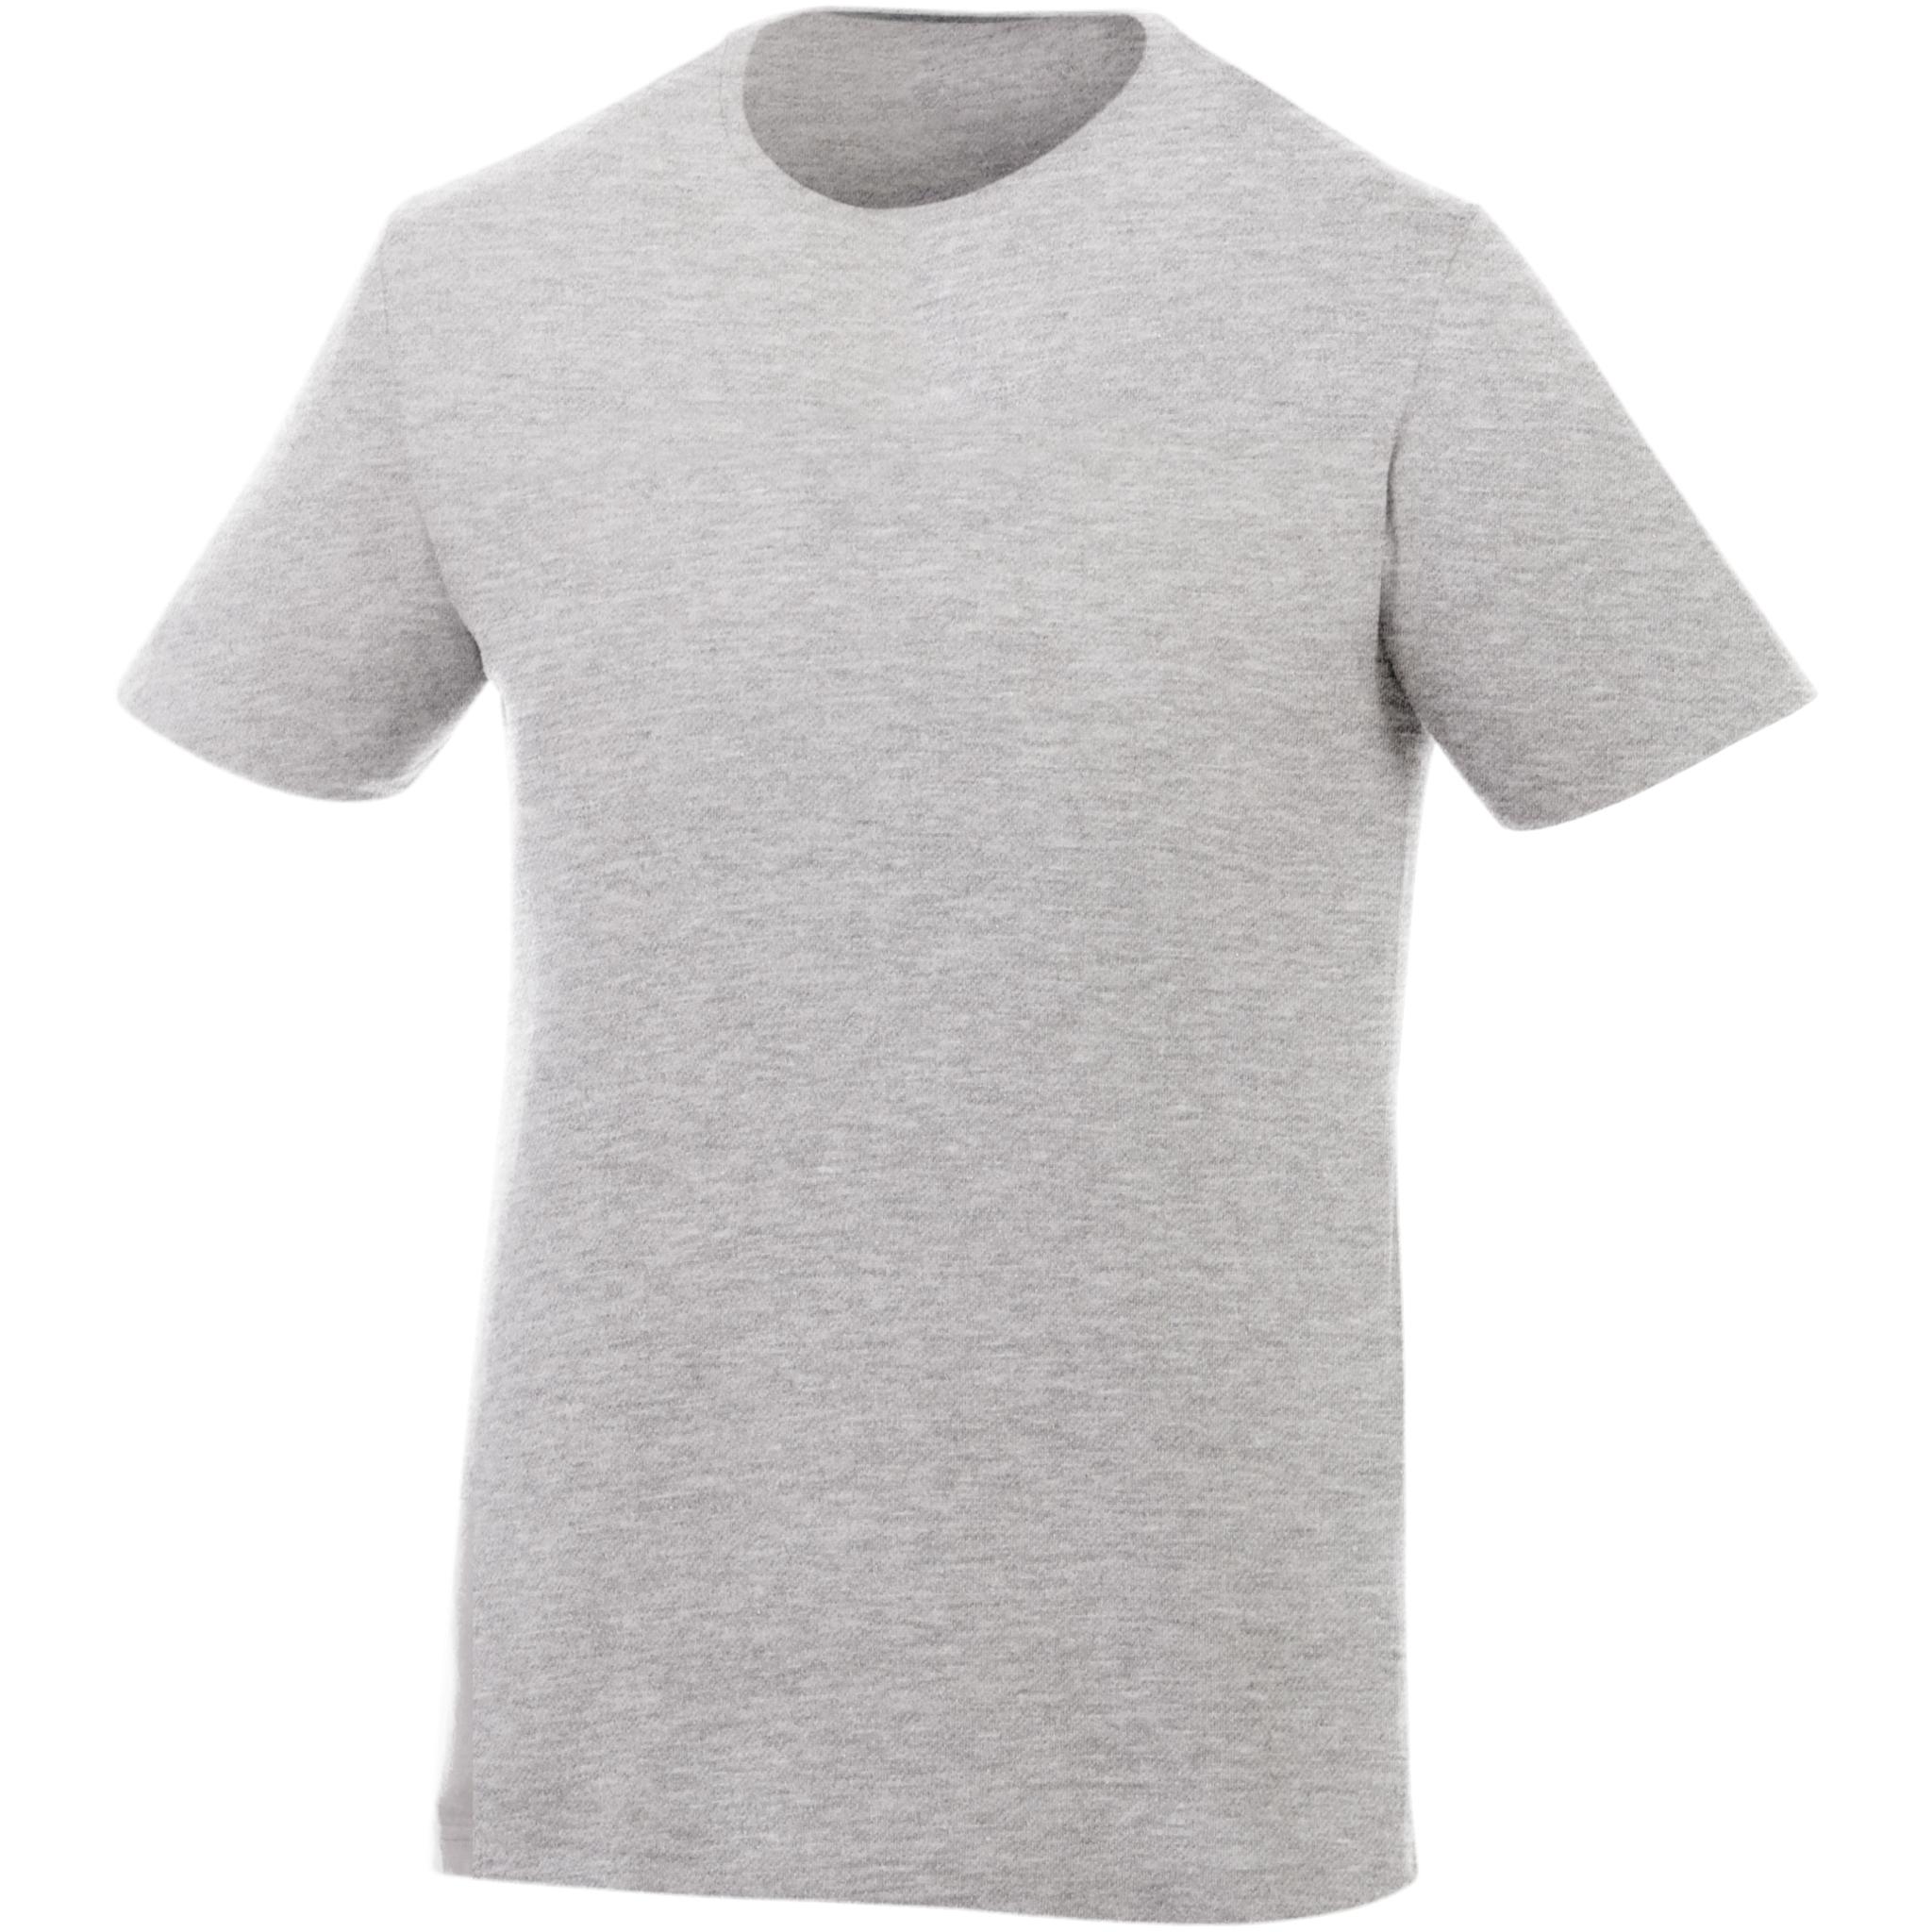 Elevate Mens Finney Short Sleeve T-Shirt (S) (Heather Grey)